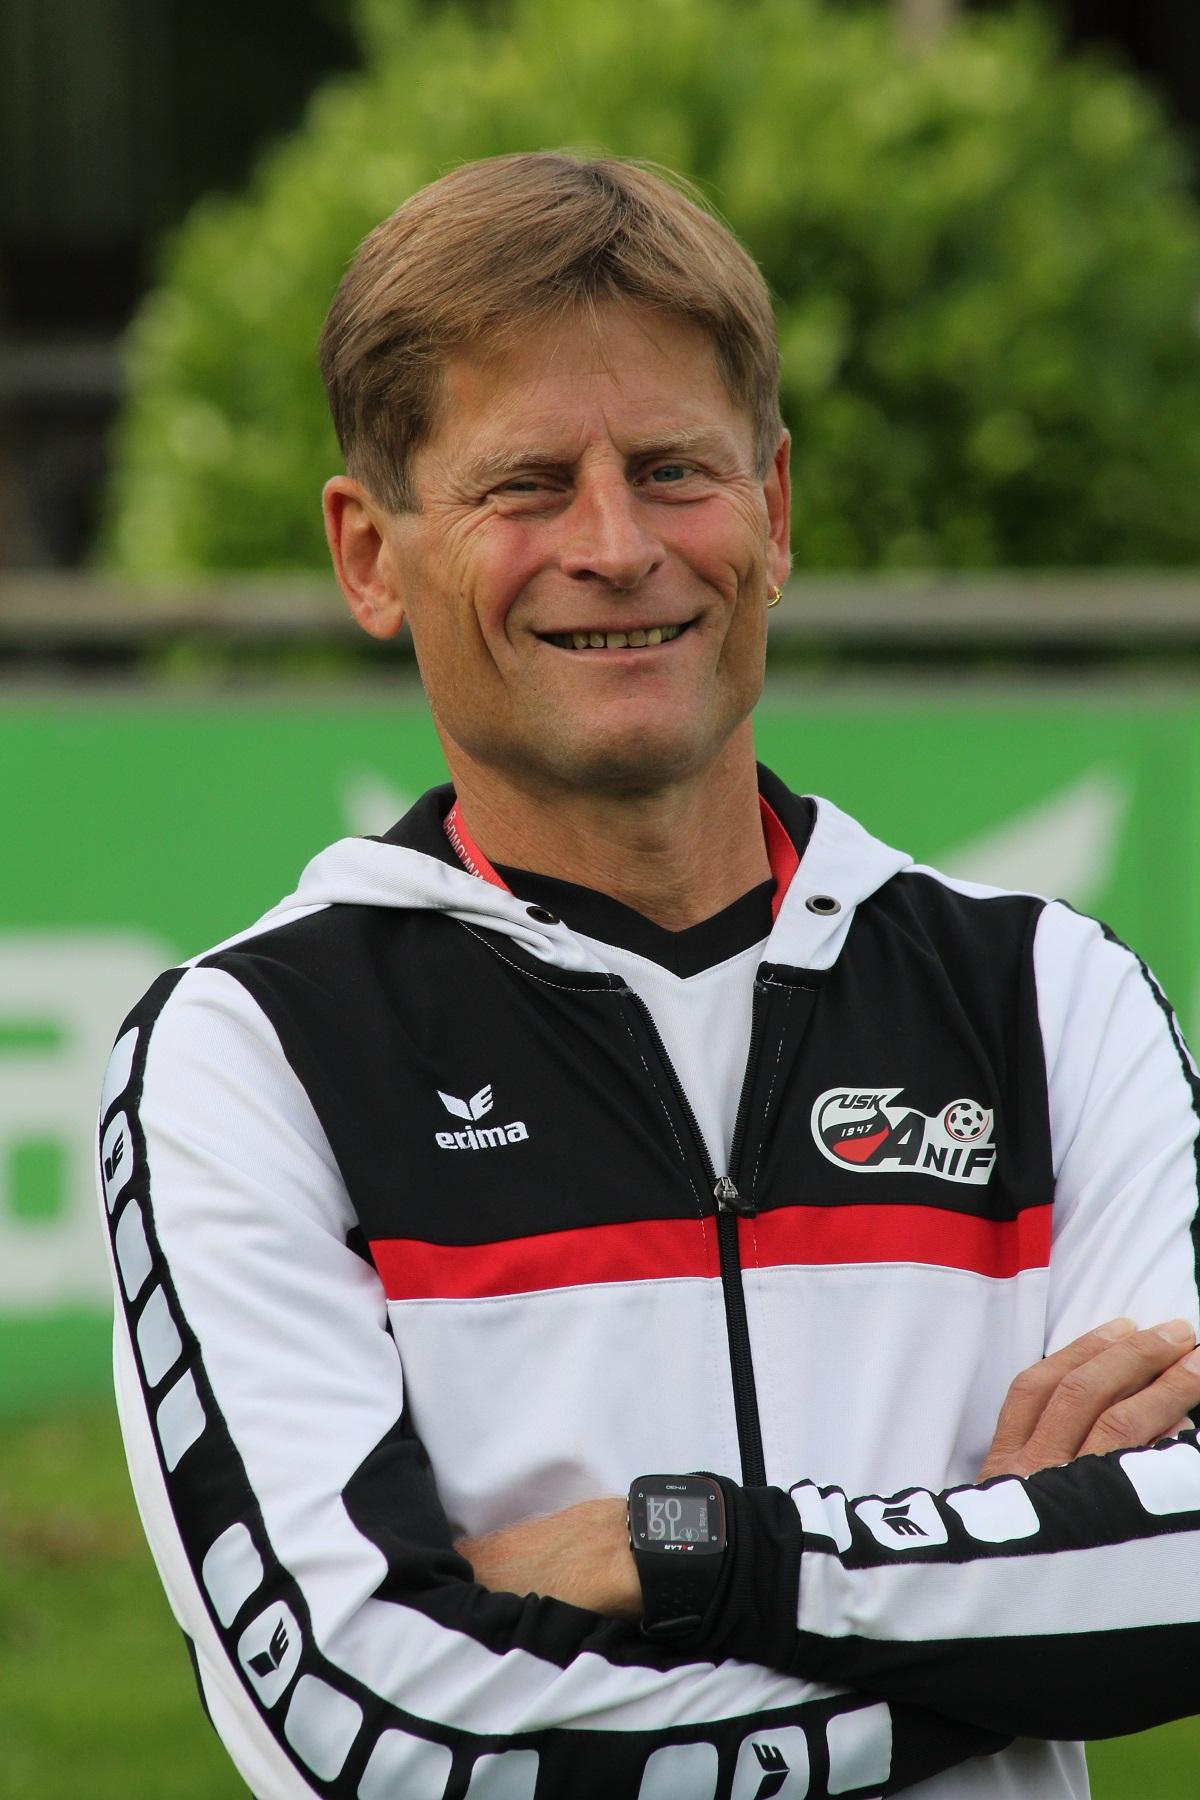 Klaus Baumann, USK-Anif